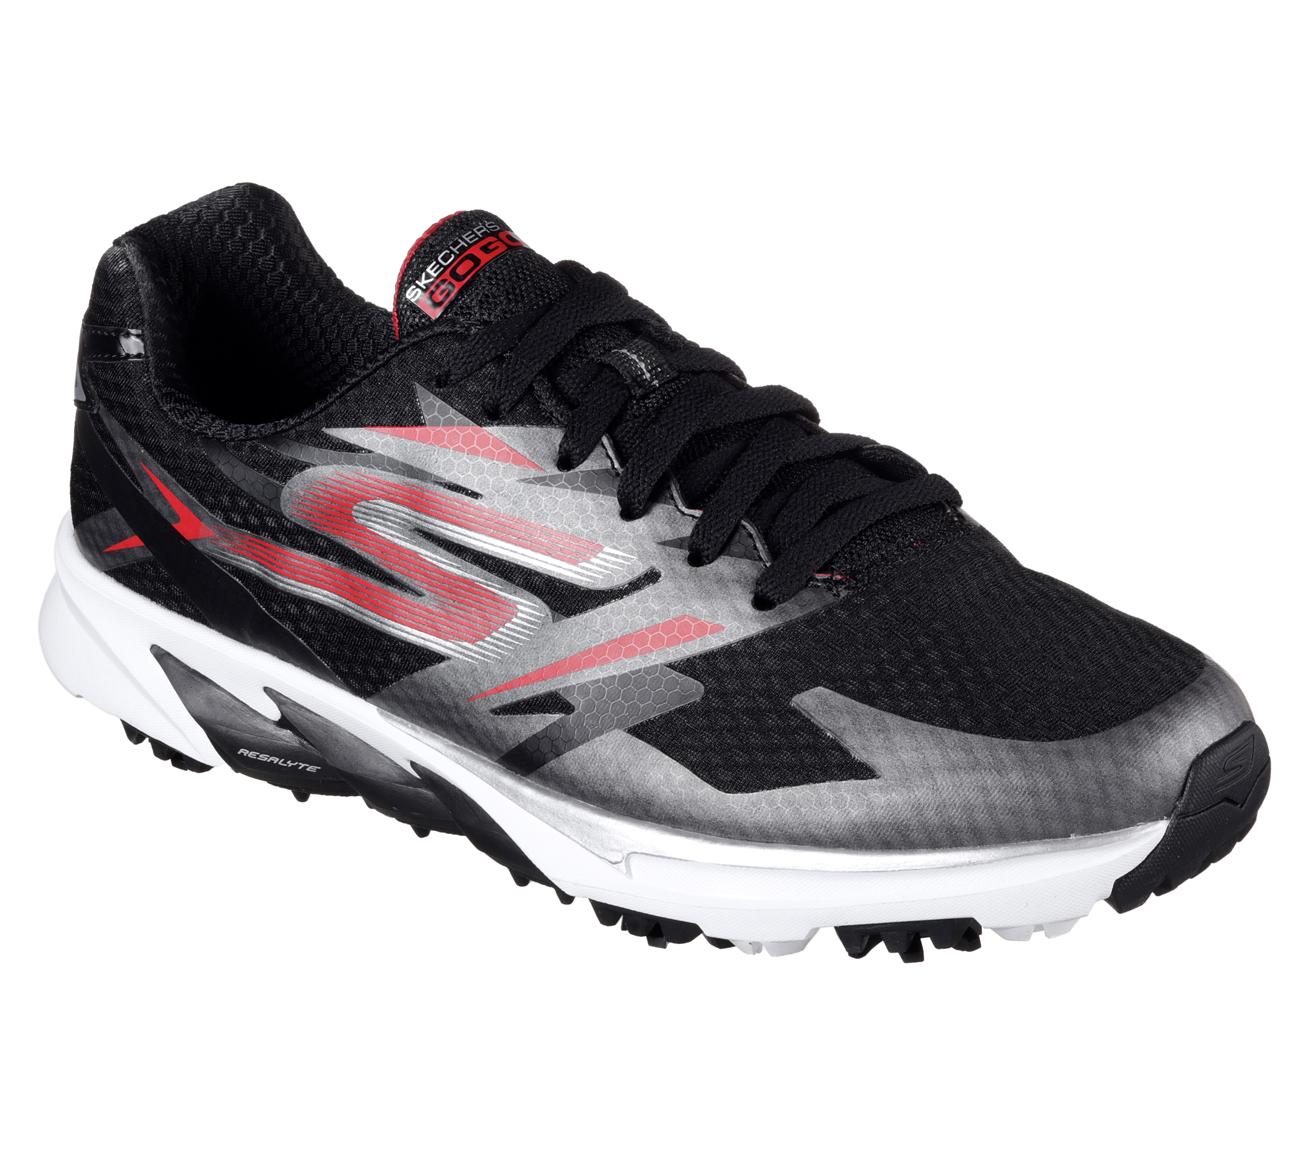 Skechers Go Golf Blade Power Golf Shoes Black Red